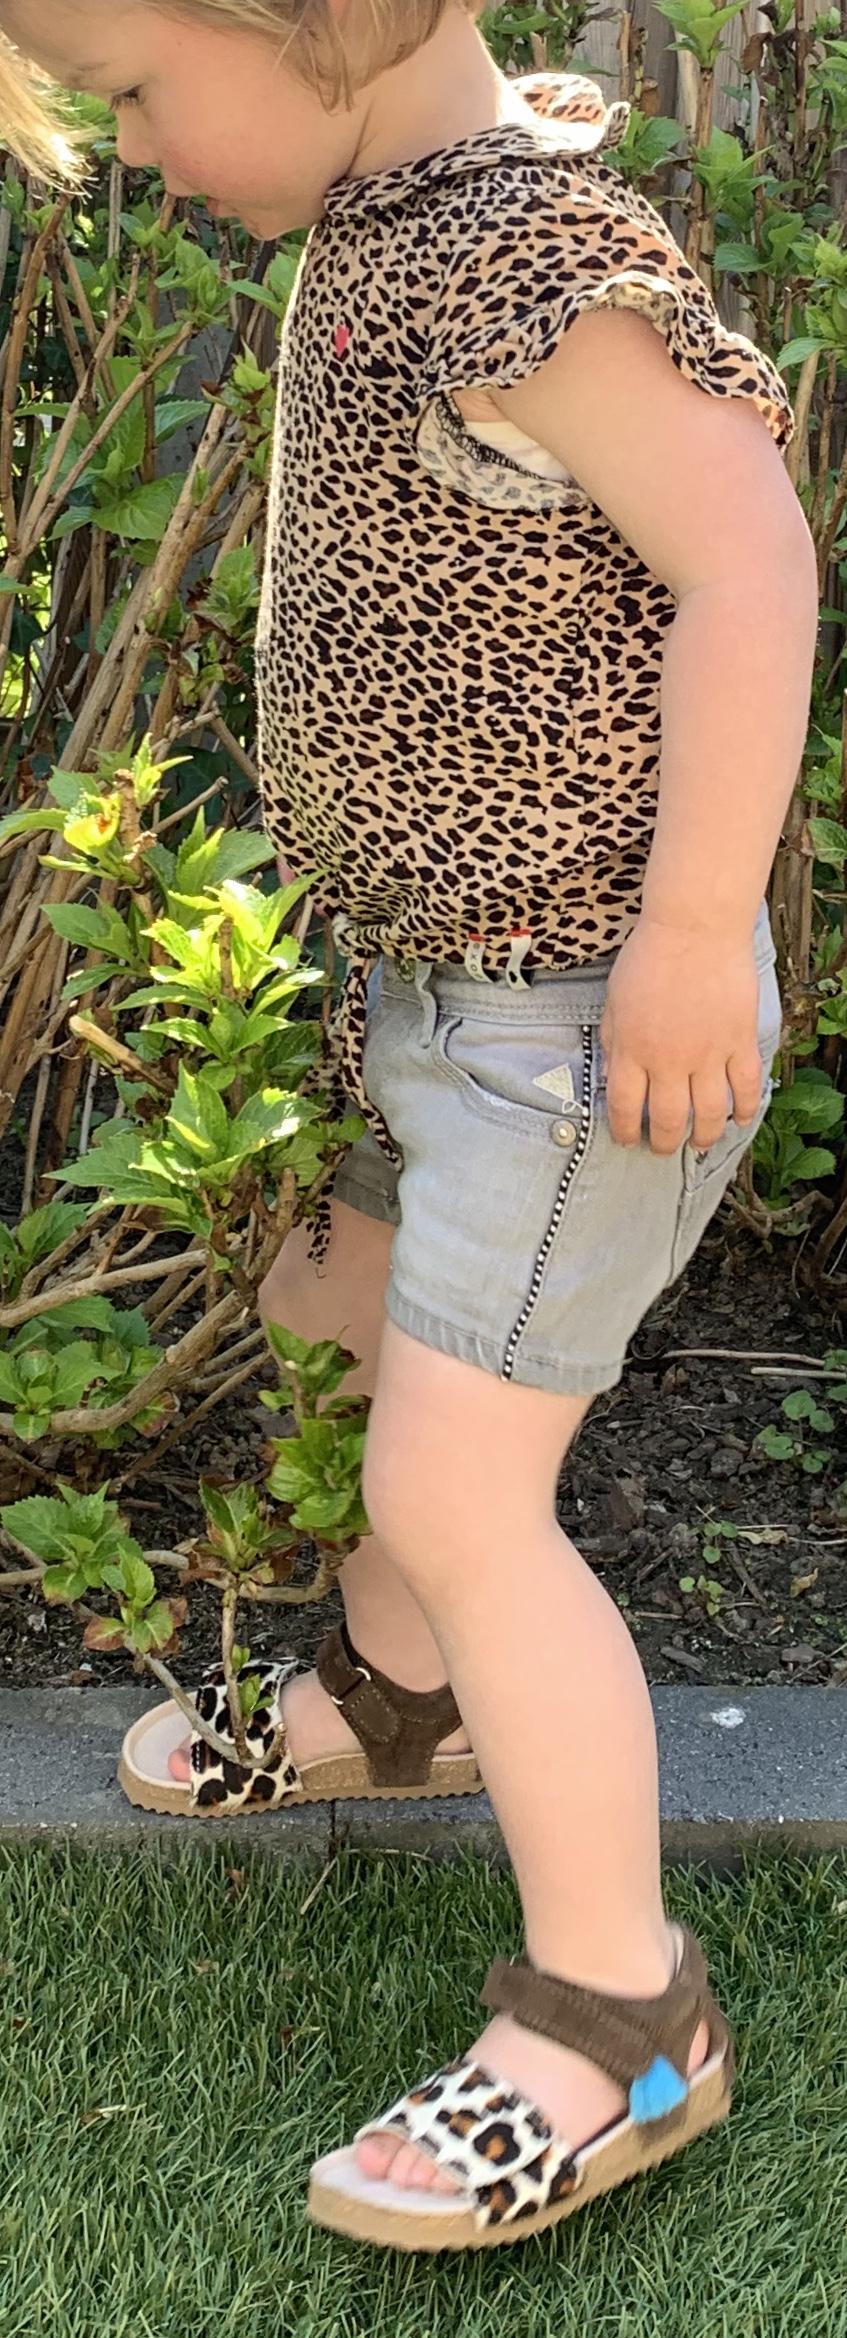 luipaard print sandalen, shoesme sandalen, hippe kindersandalen, kindersandalen met luipaardprint